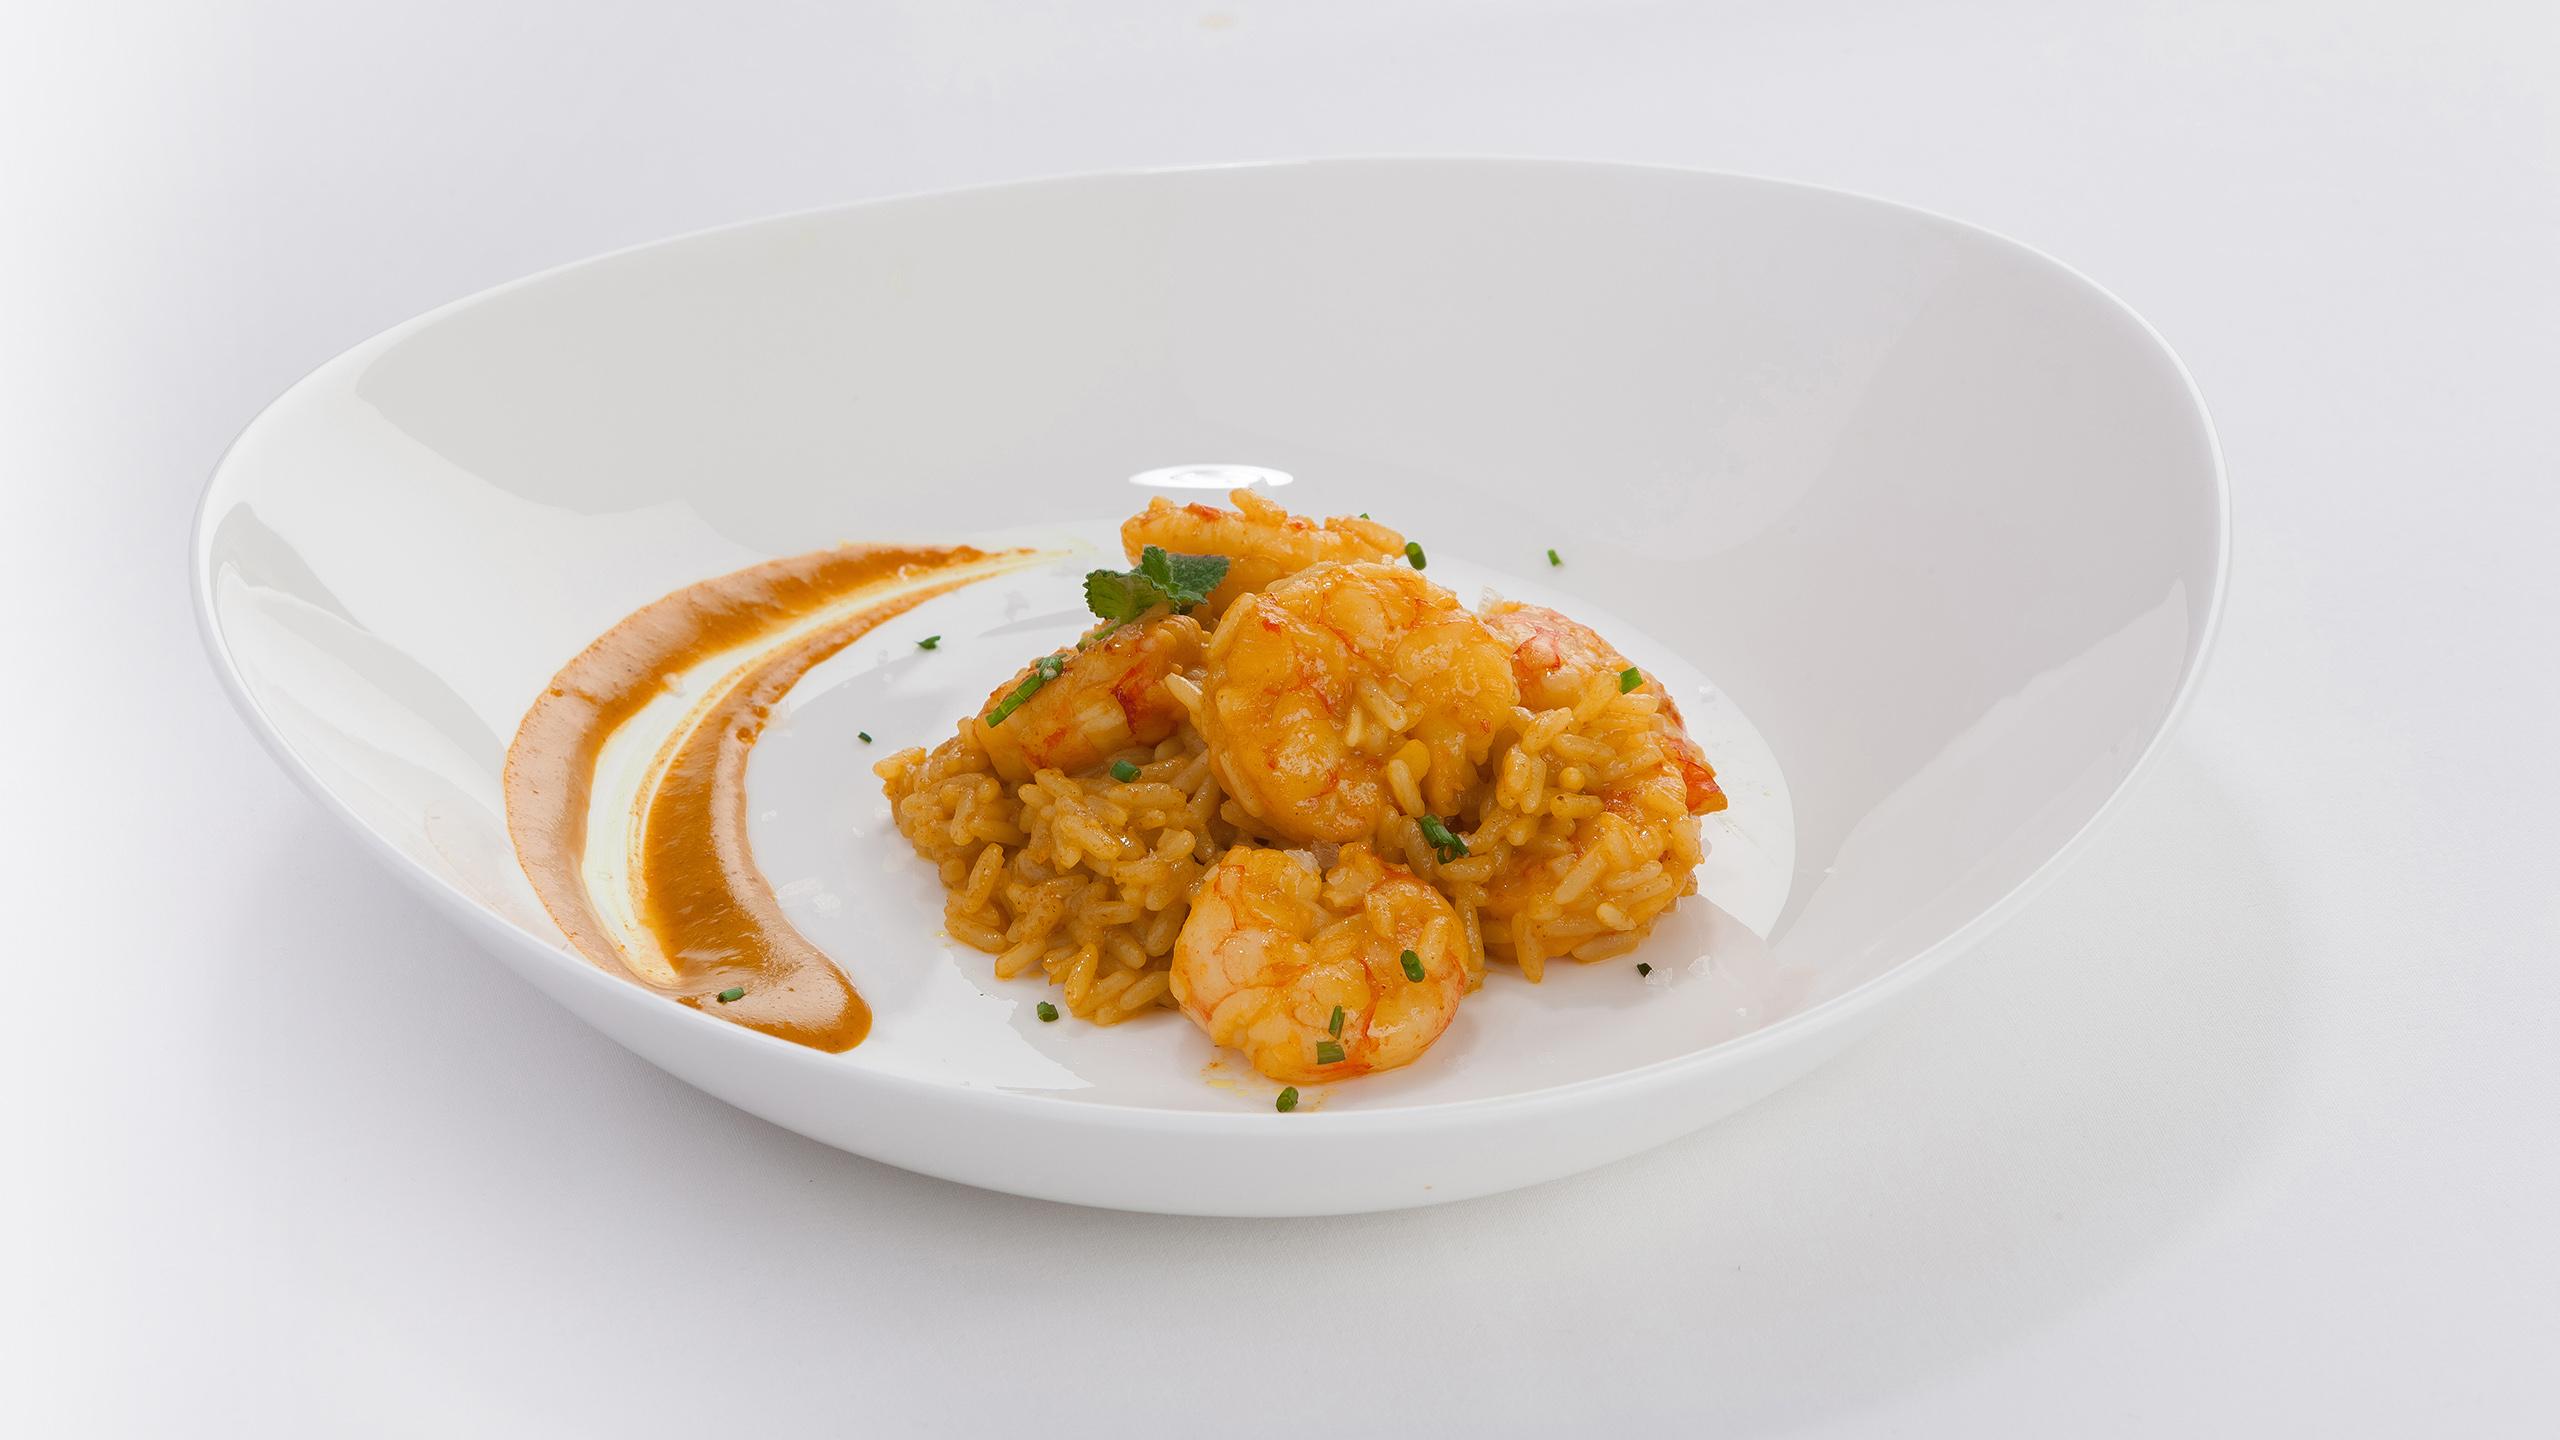 gastronomia 54 profand